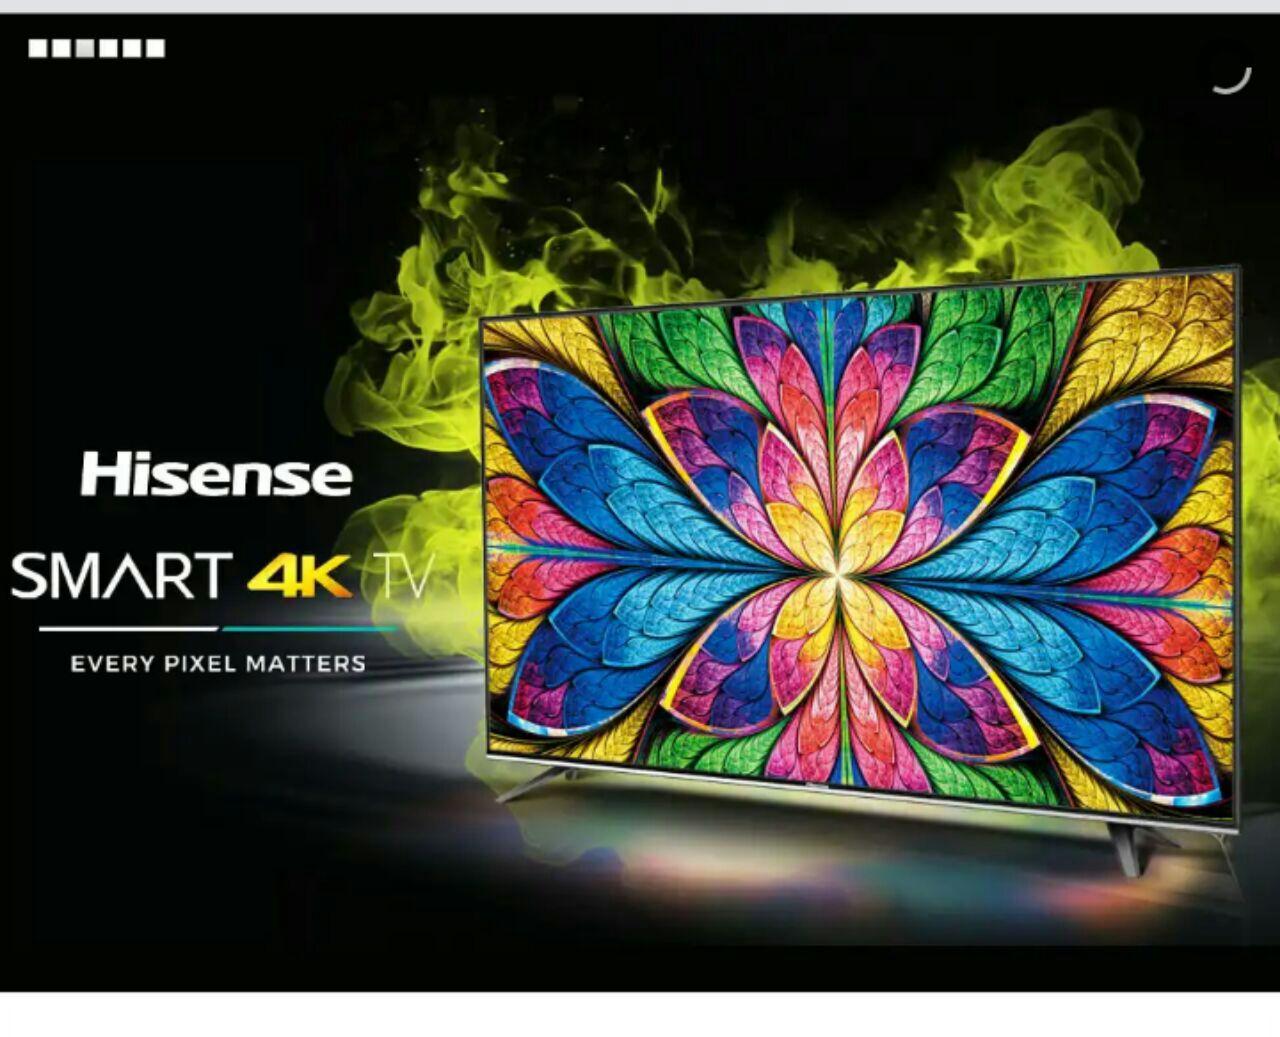 تلویزیون ال ای دی 50 اینچ هایسنس Hisense فورکی 4k اسمارت smart